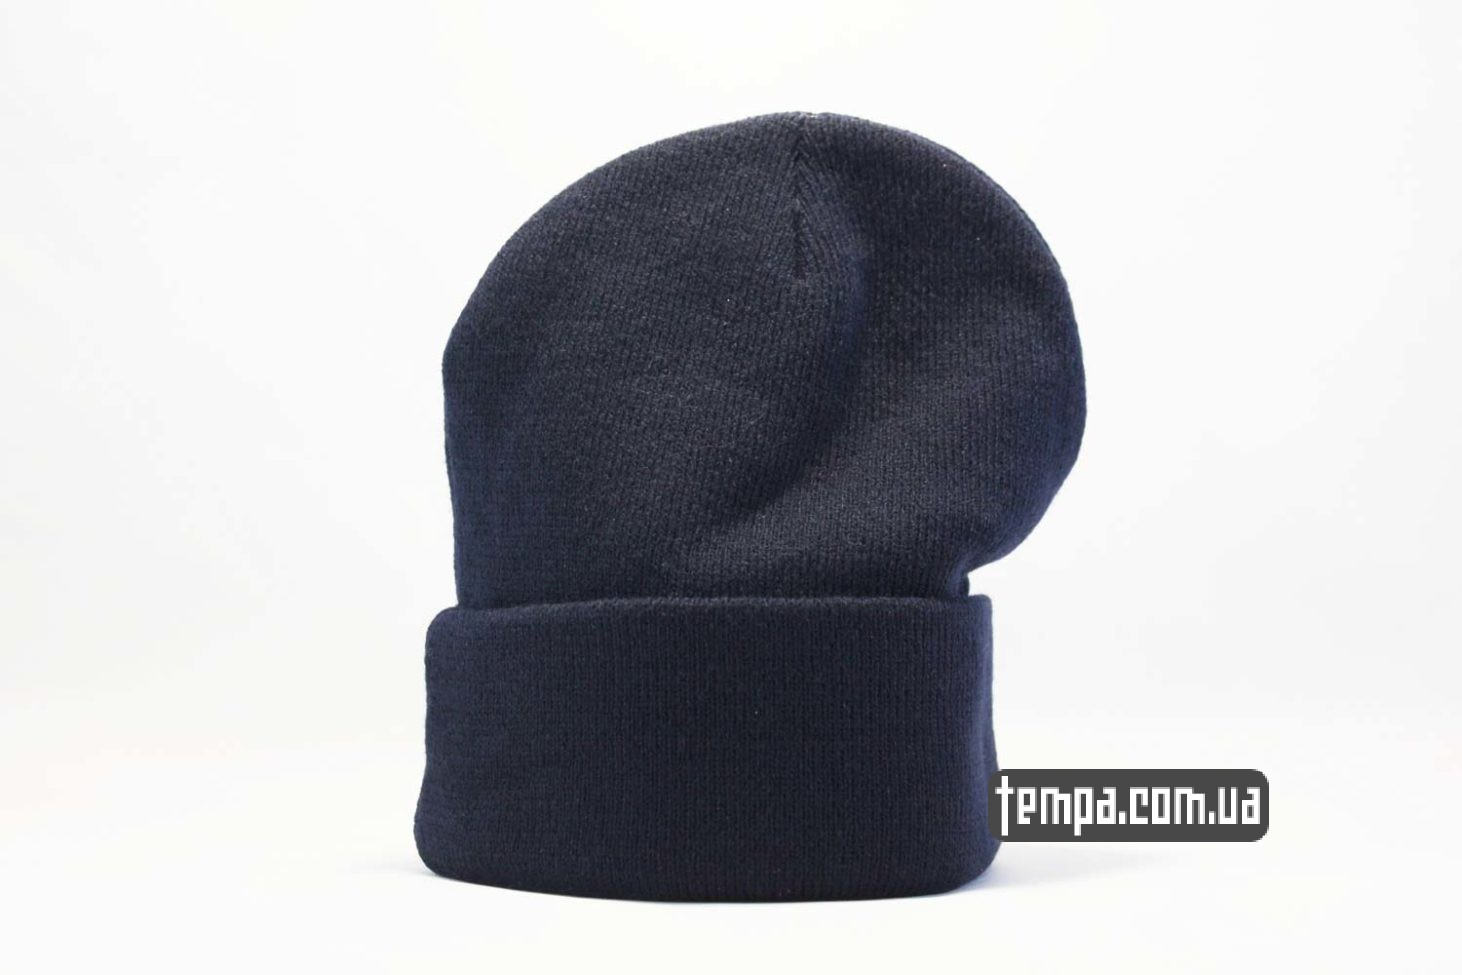 рибок магазин шапка beanie REEBOK синяя бини купить